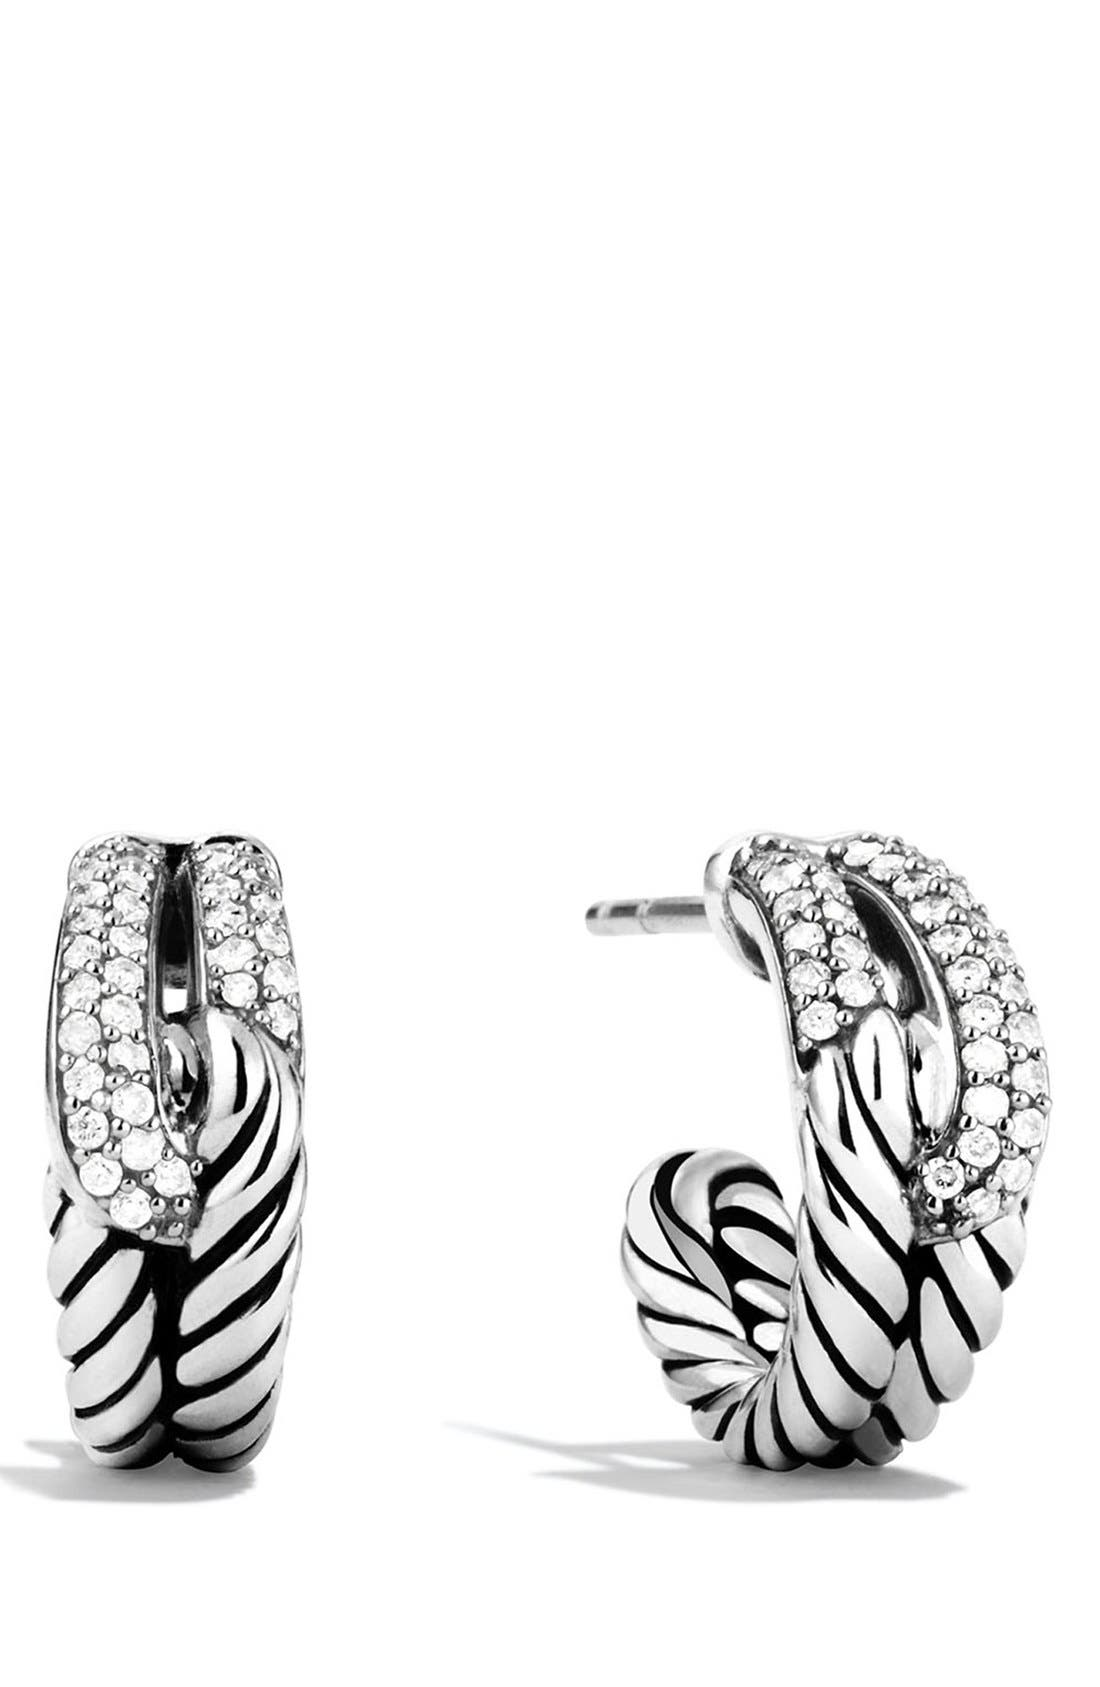 'Labyrinth' Single Loop Earrings with Diamonds,                             Main thumbnail 1, color,                             DIAMOND